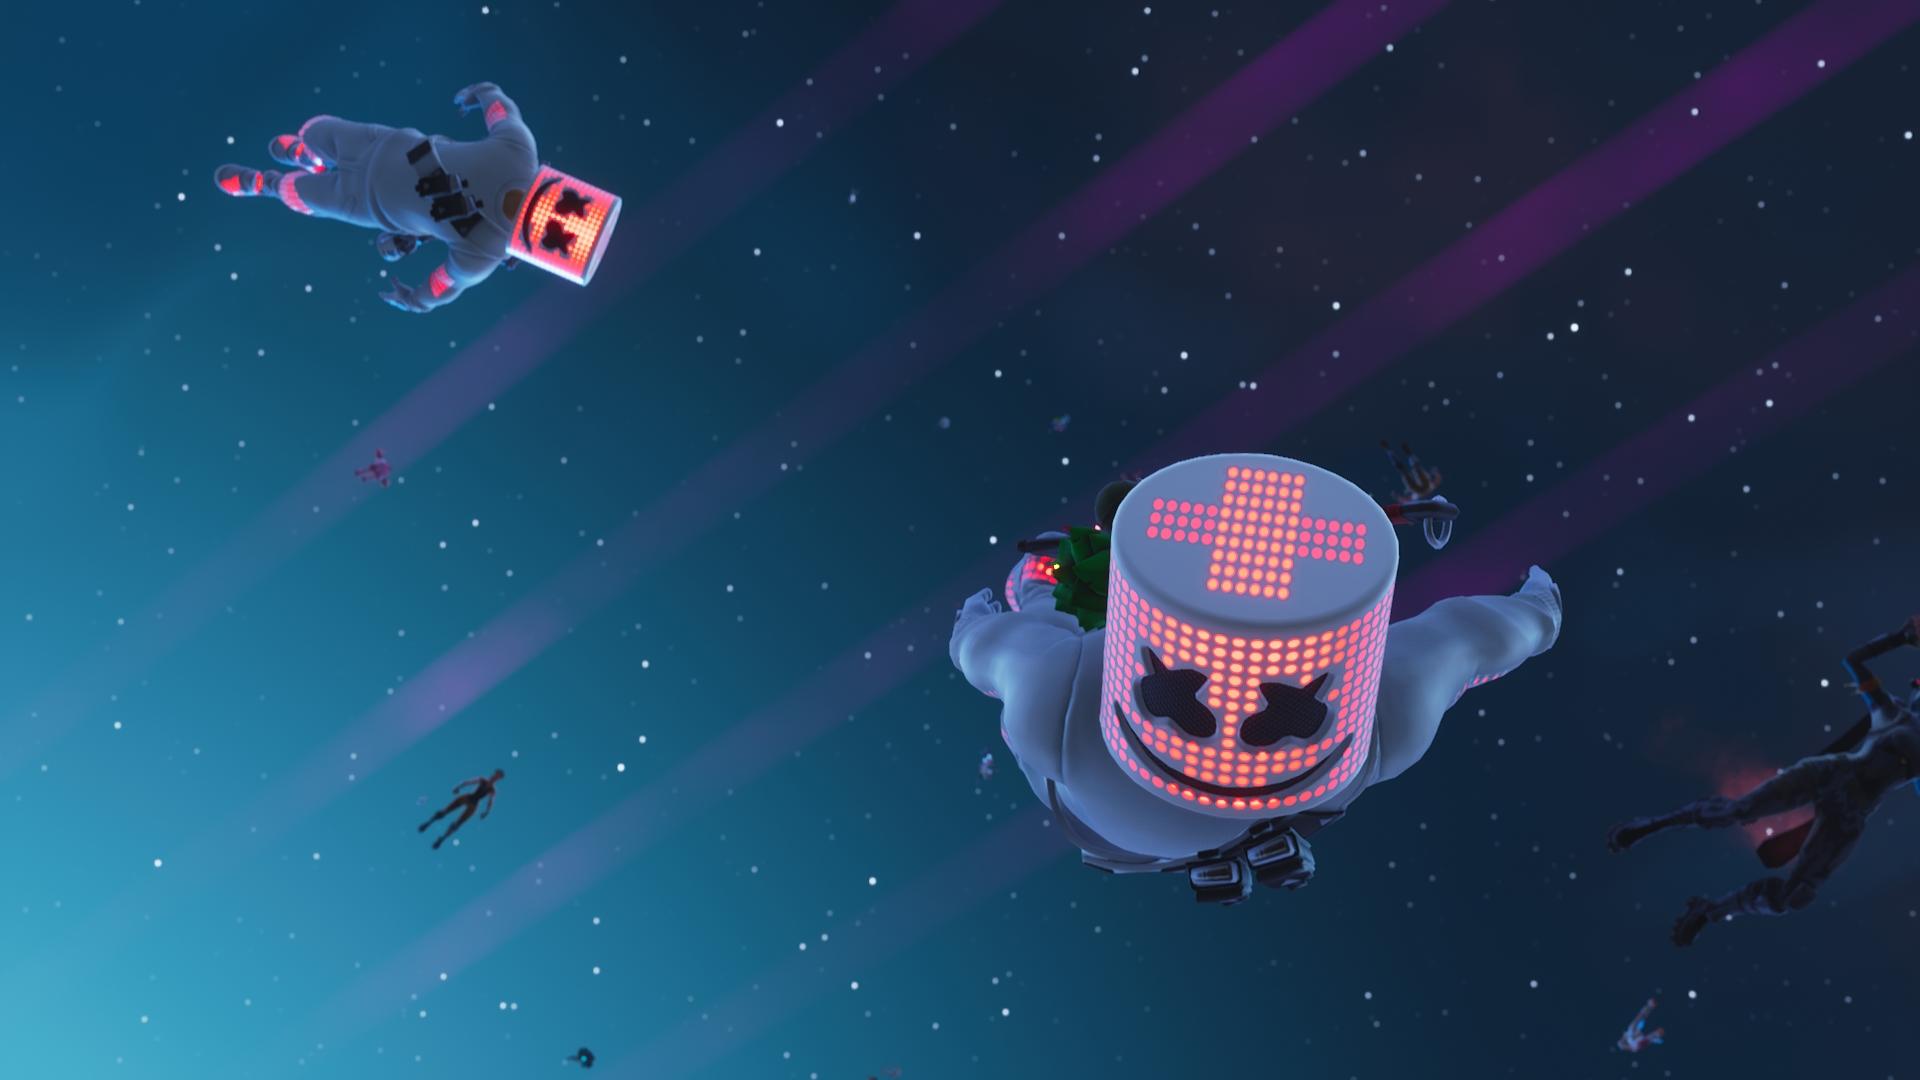 Marshmello Fortnite, HD Games, 4k Wallpapers, Images ...